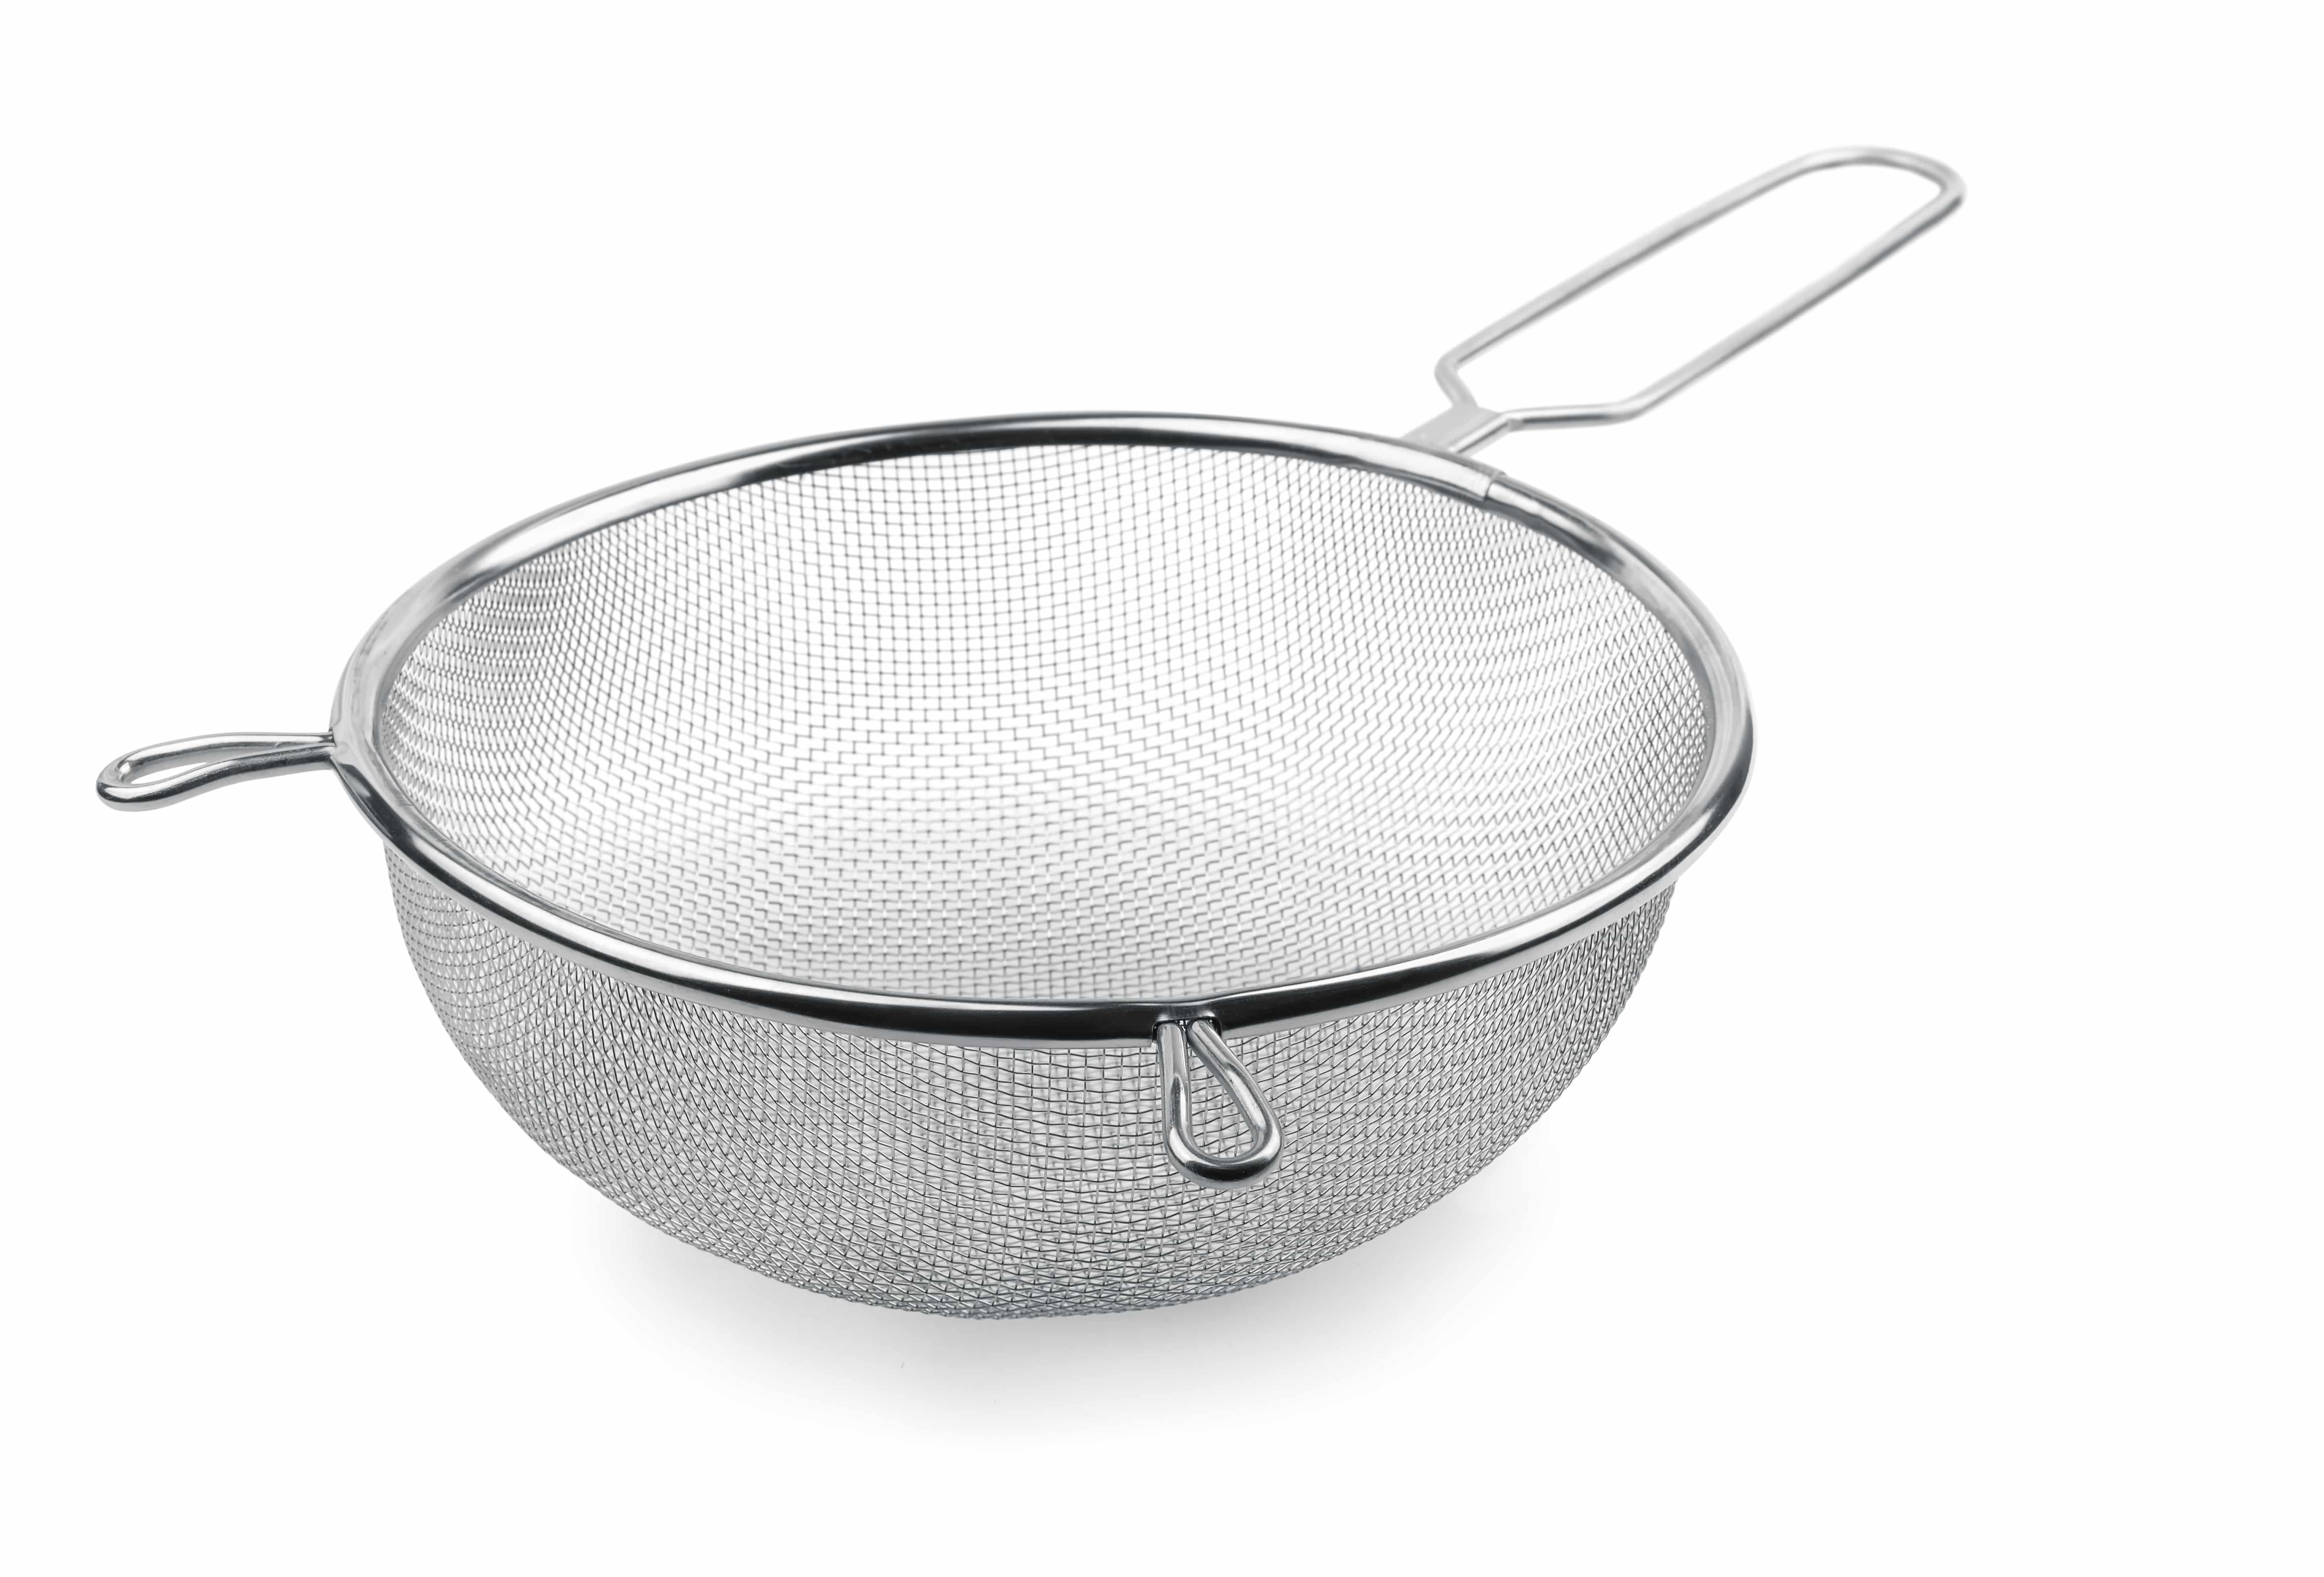 Metal kitchen sieve isolated on white